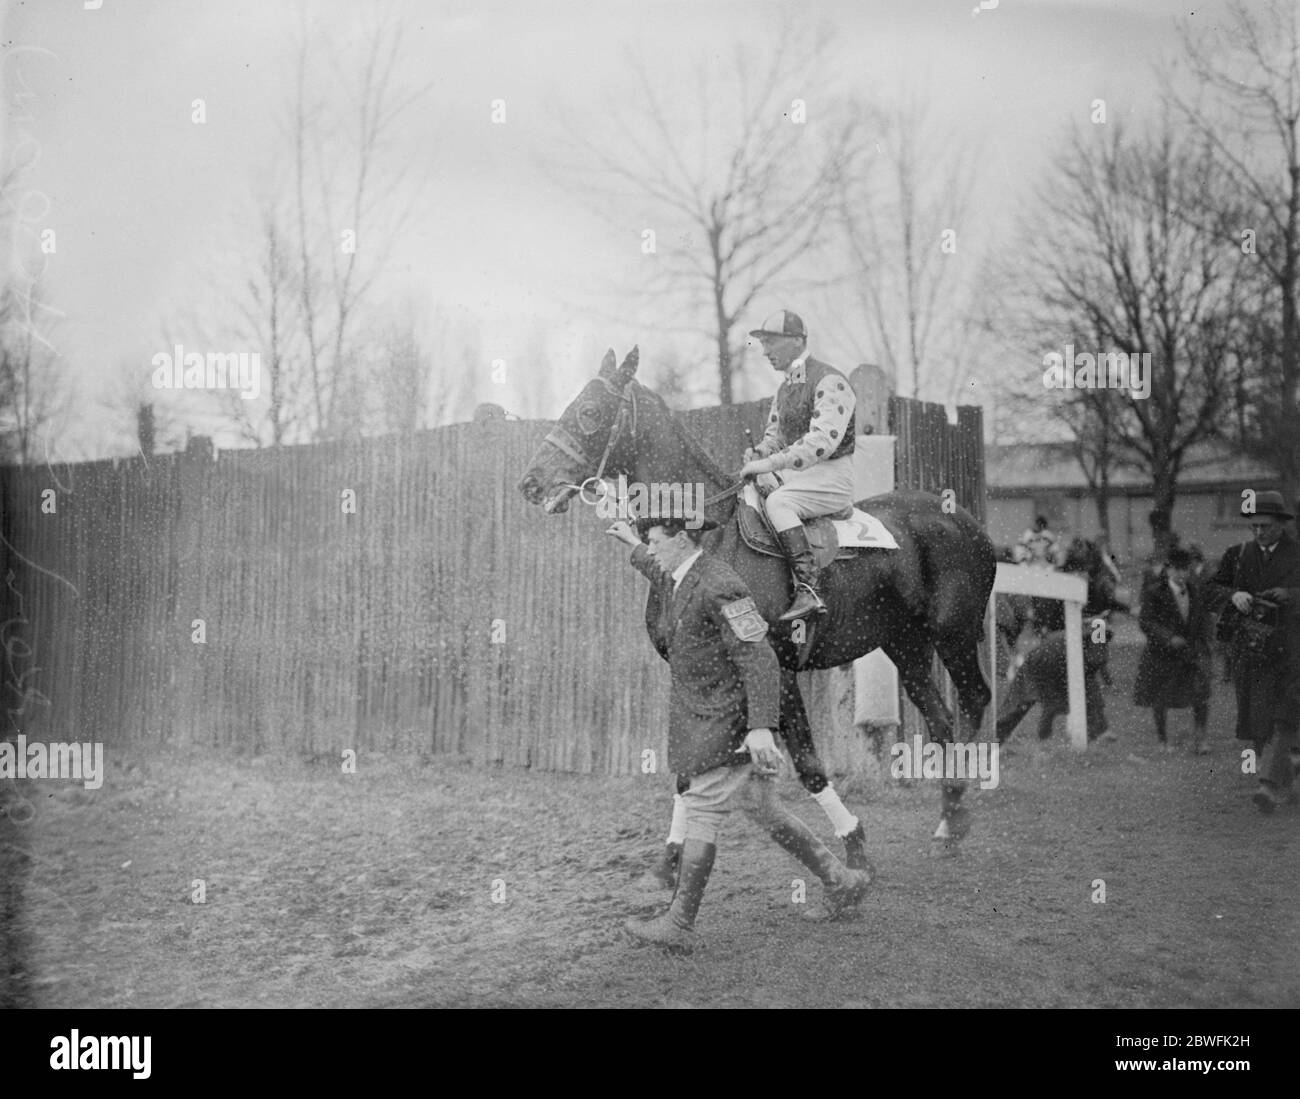 Hawker , J Hogan, 29 février 1924 Banque D'Images